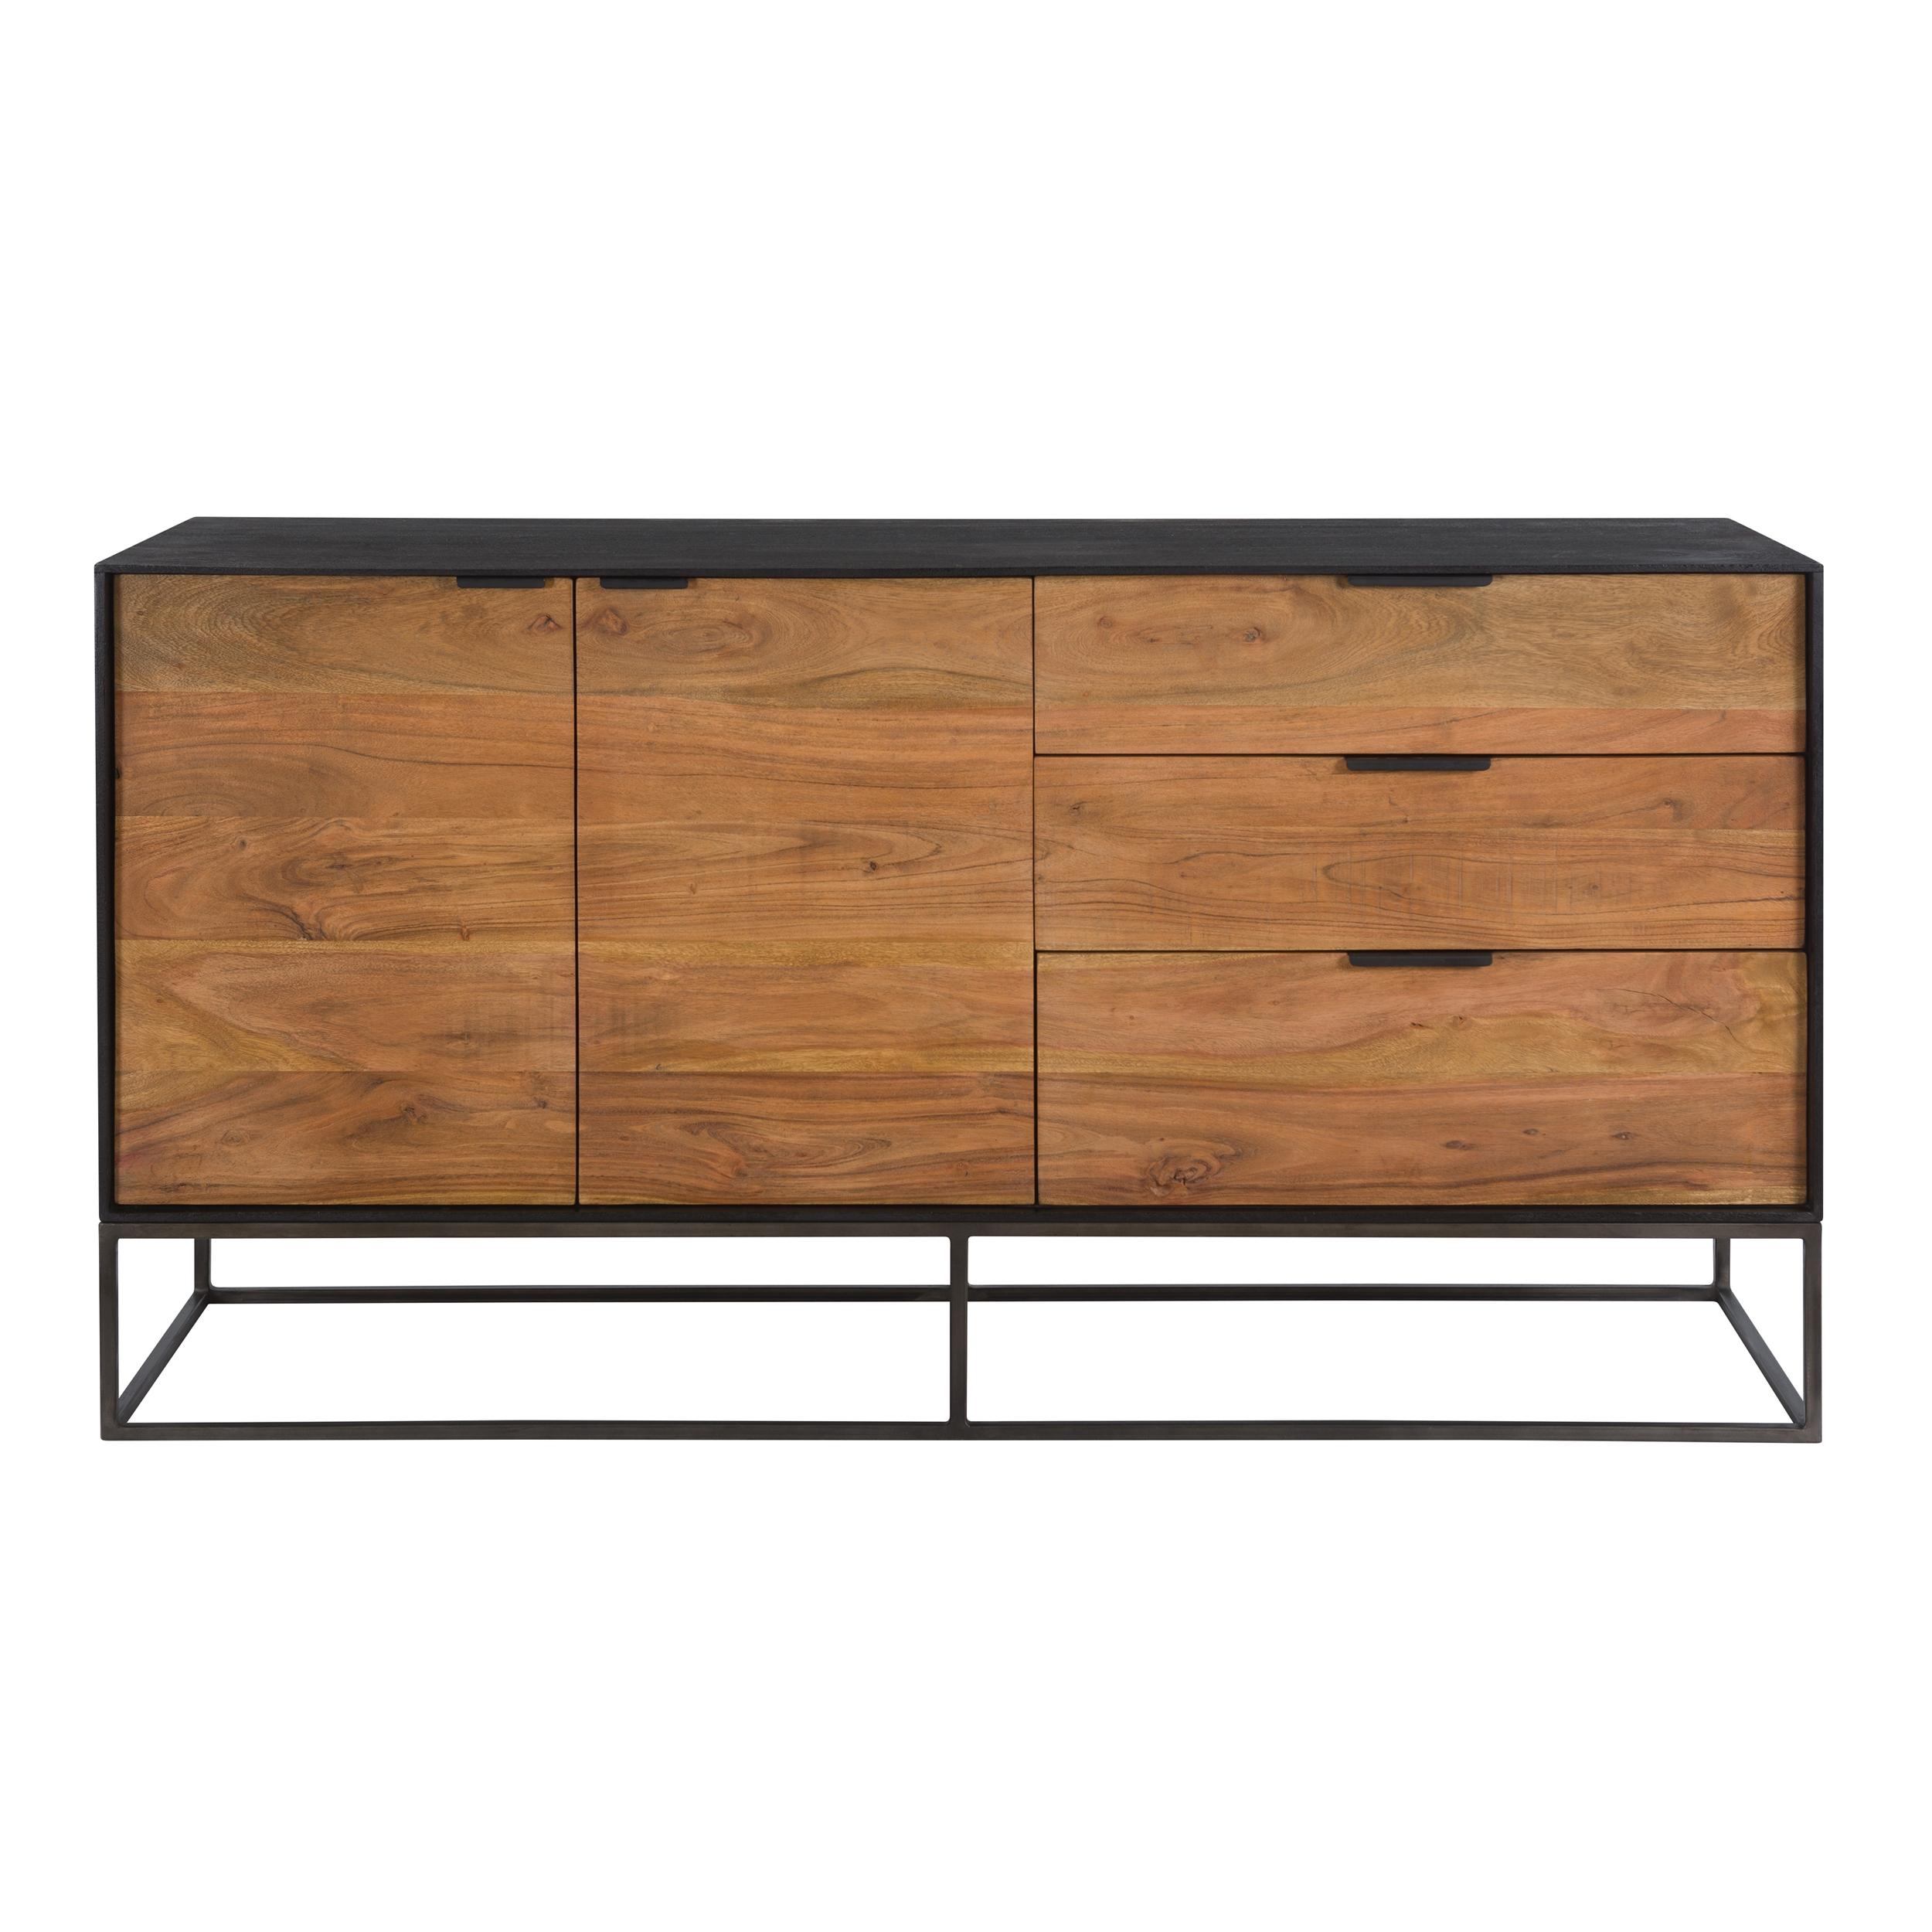 Buffet 2 portes 3 tiroirs en bois d'acacia, pieds en métal